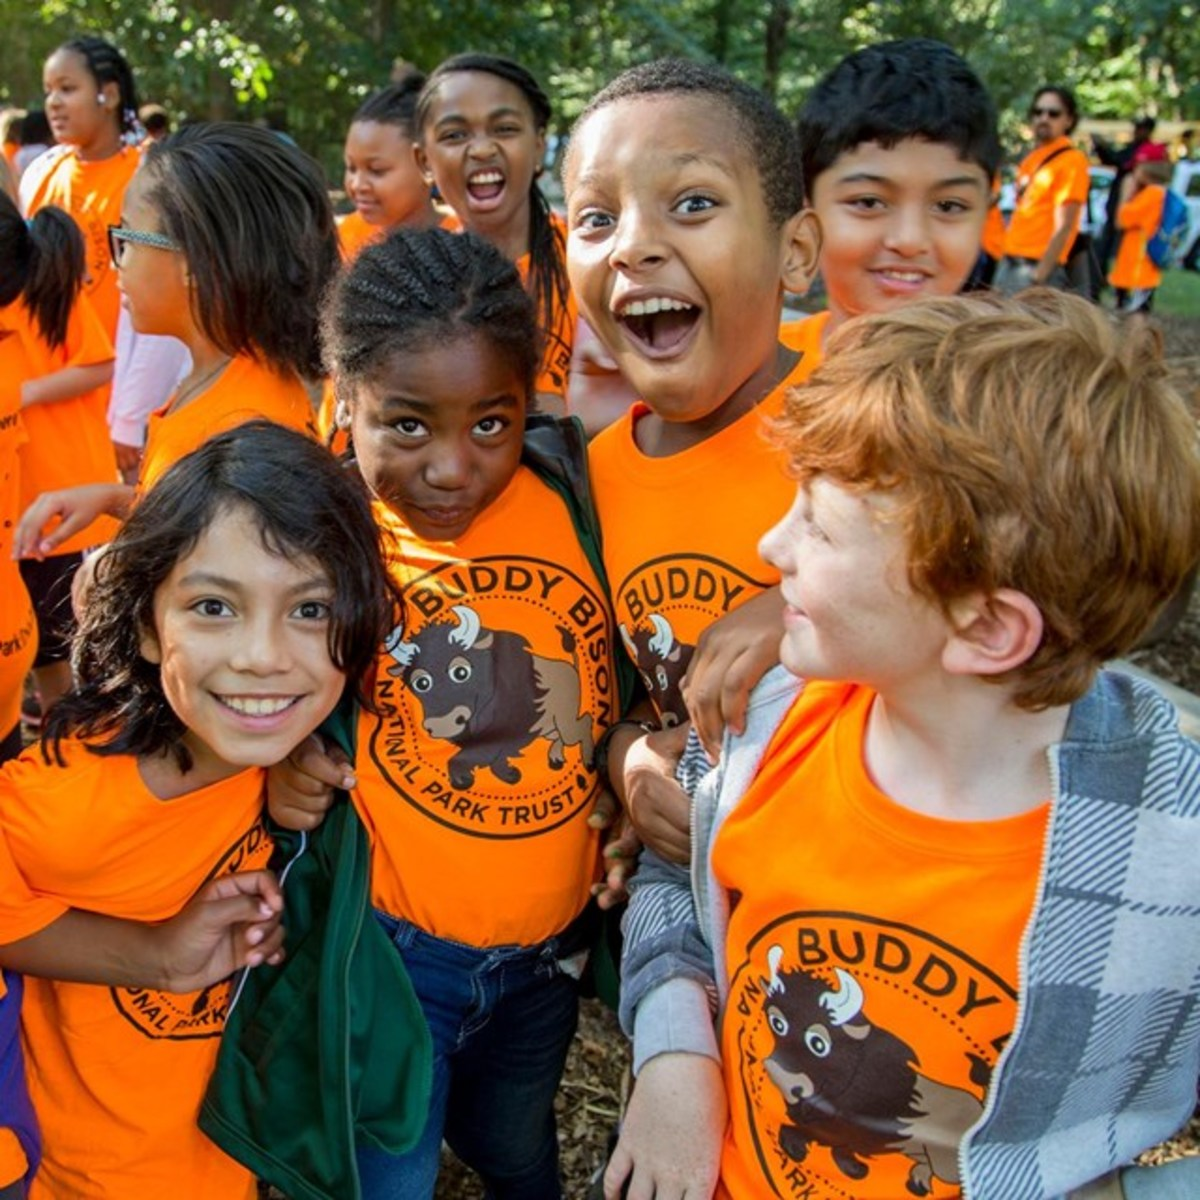 U.S. National Park Service: Every Kid Outdoors